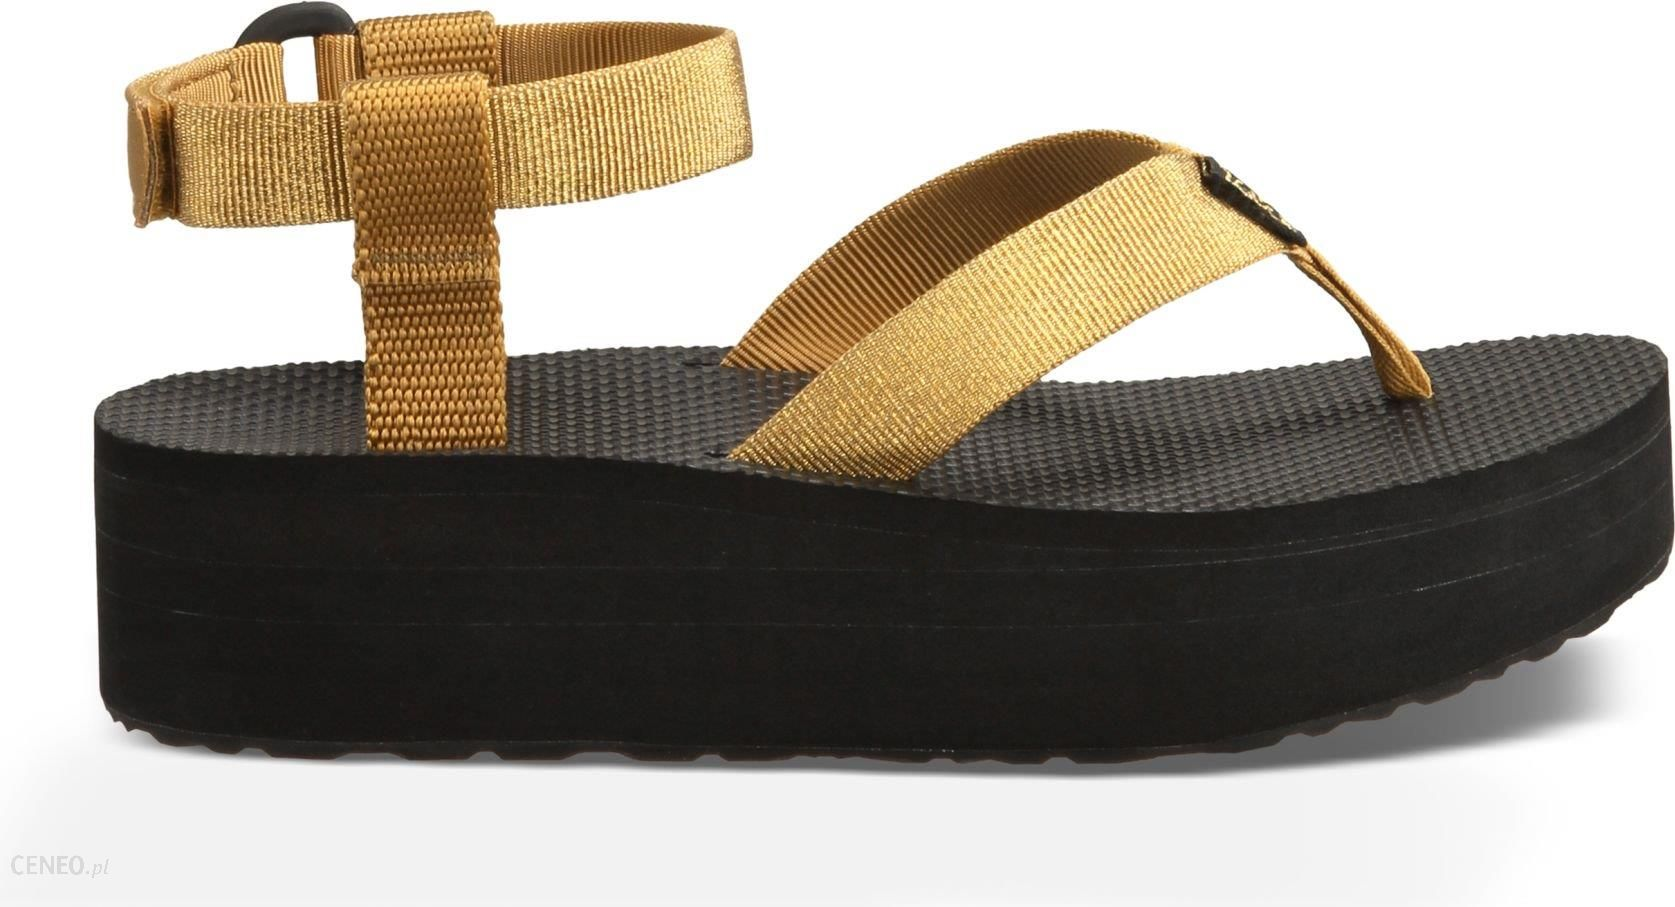 cd576f41e1a TEVA Sandały WS Flatform Sandal 38 (1008843-GOLD-7) - Ceny i opinie ...